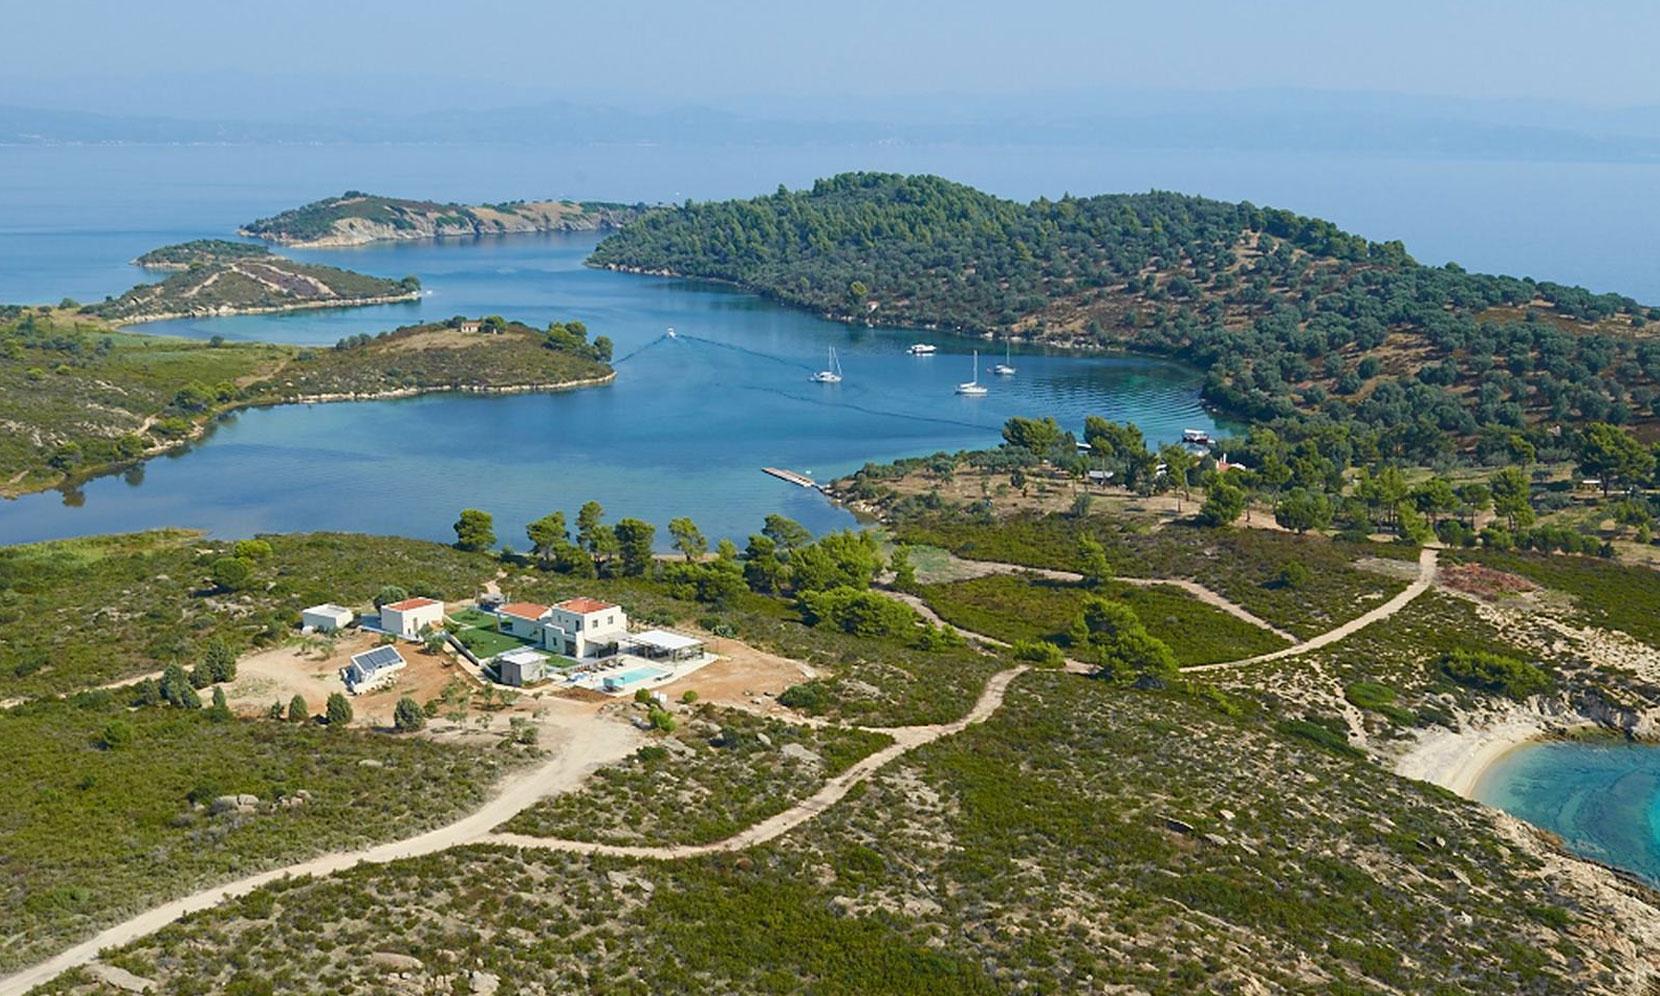 Halkidiki Villa Treasure jumbotron image